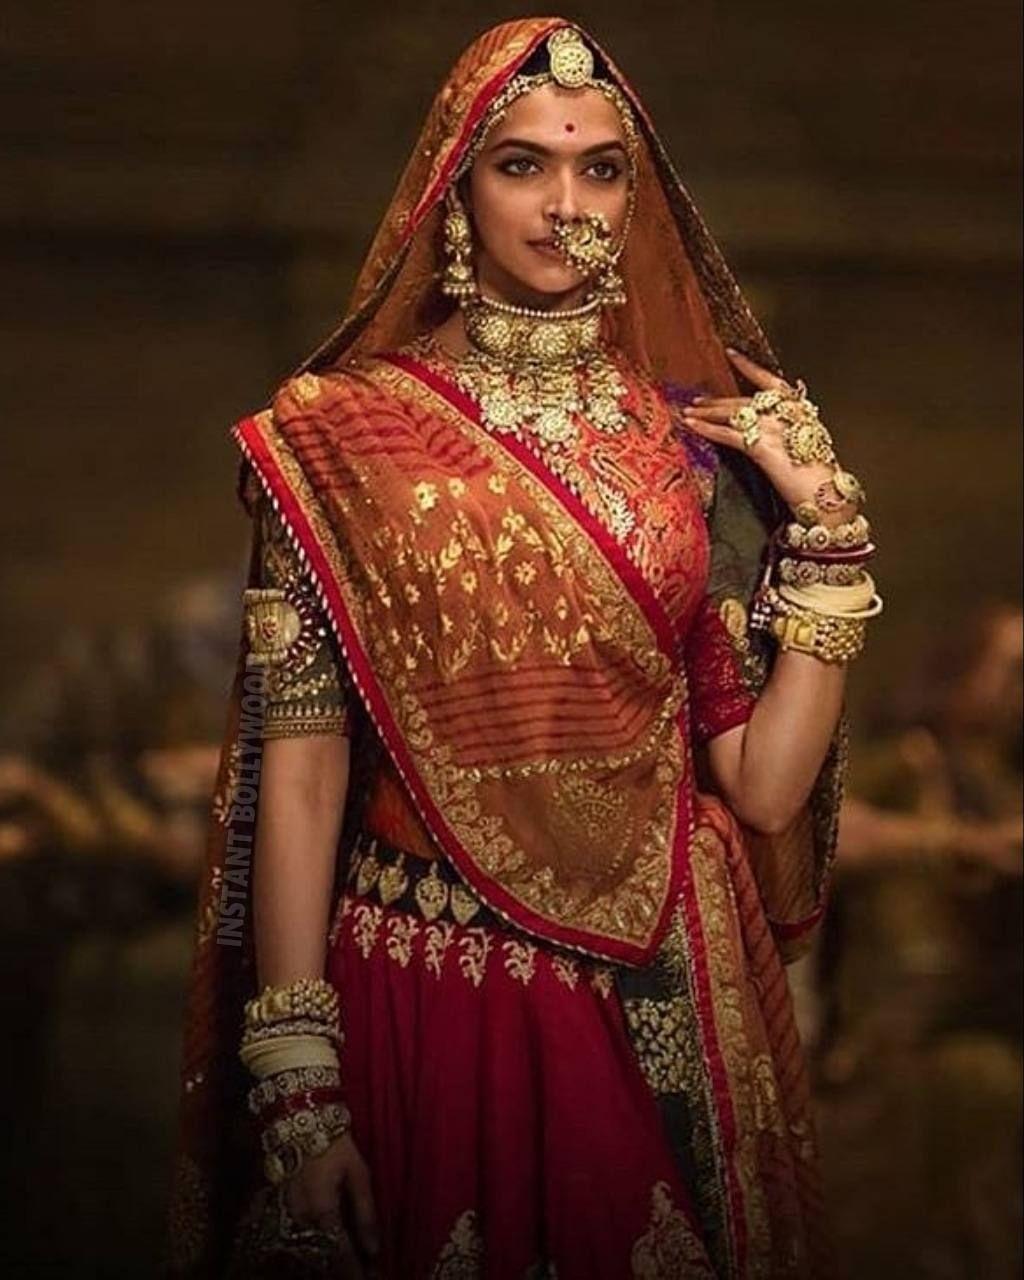 Deepika Padukone as Rani Padmavati in Padmaavat ...